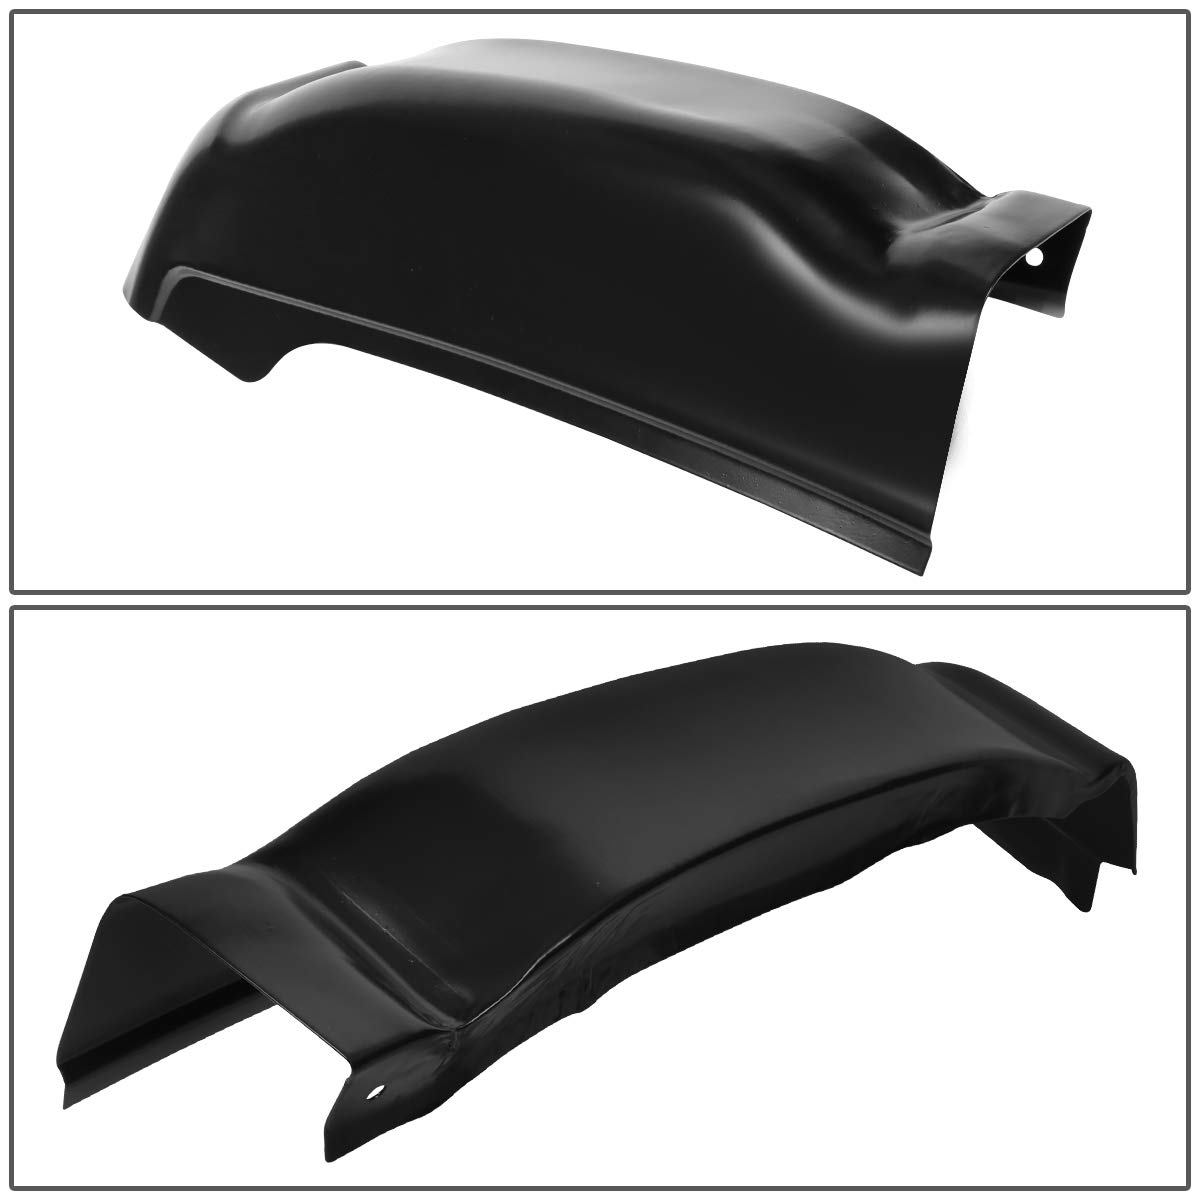 RDX-Racedesign RDHL43 Trunk Lid Spoiler 43-inch// 109 cm Universal Size